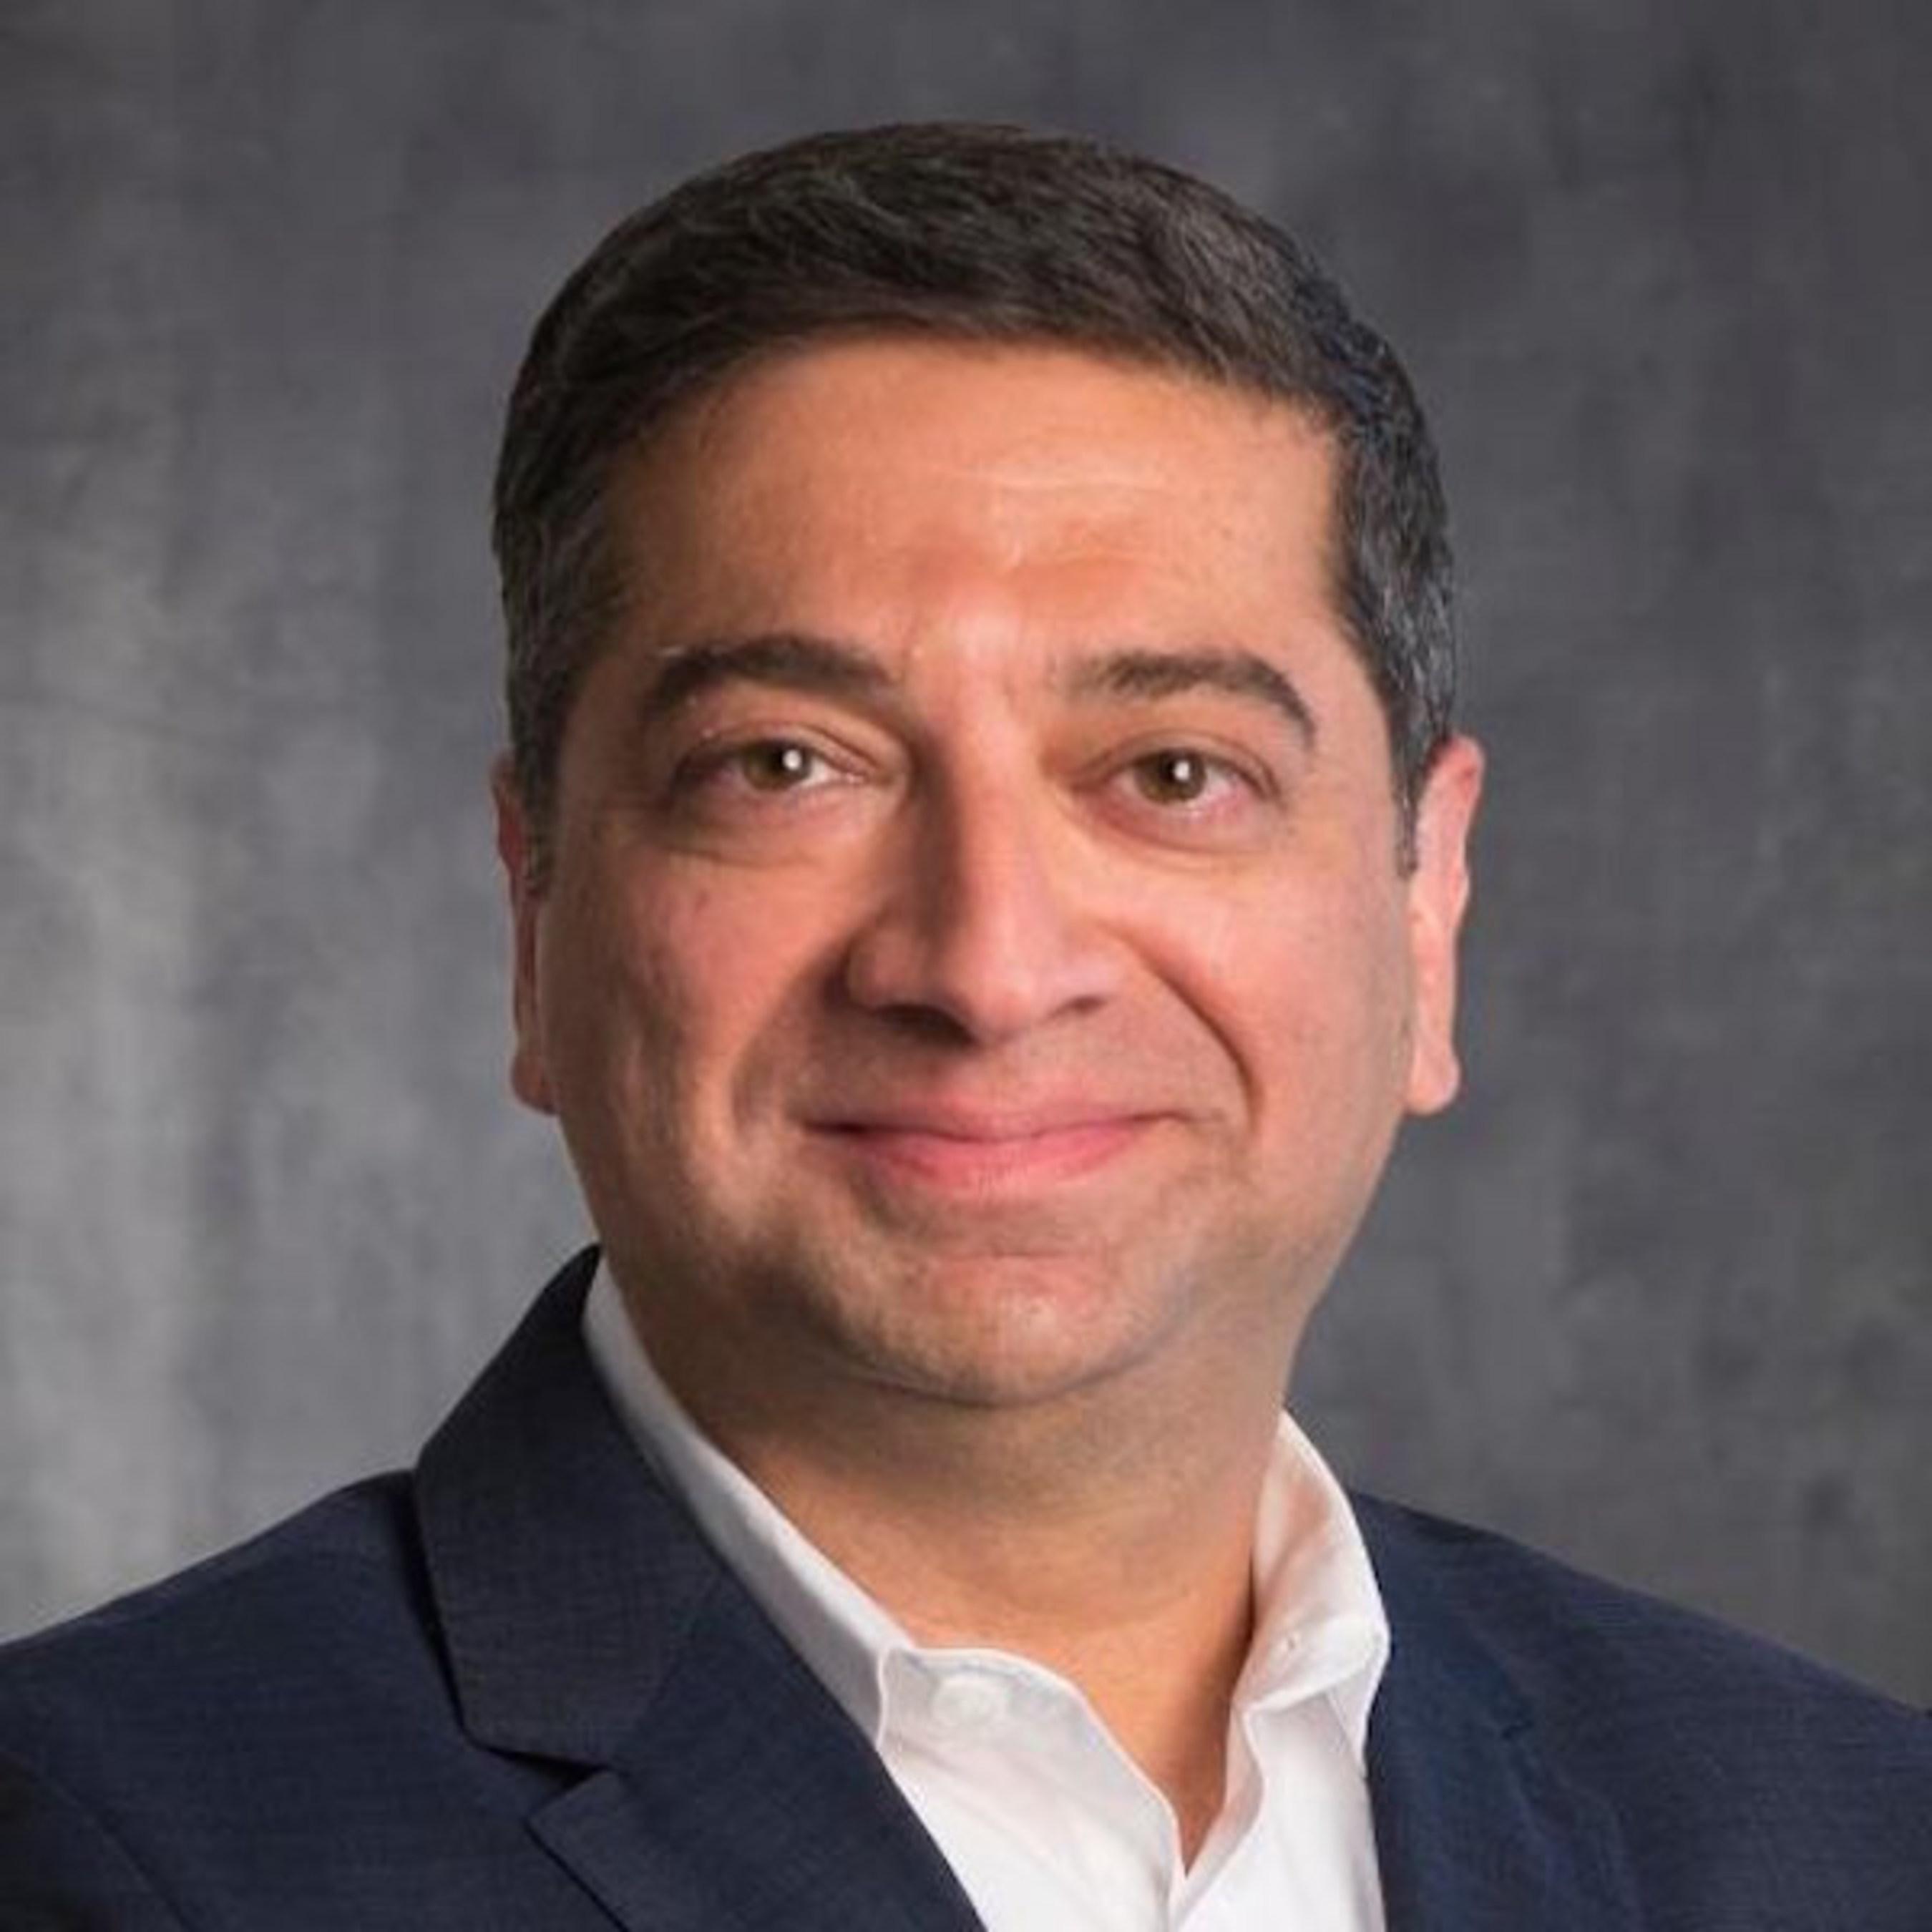 WatchGuard Technologies Names Prakash Panjwani New Chief Executive Officer